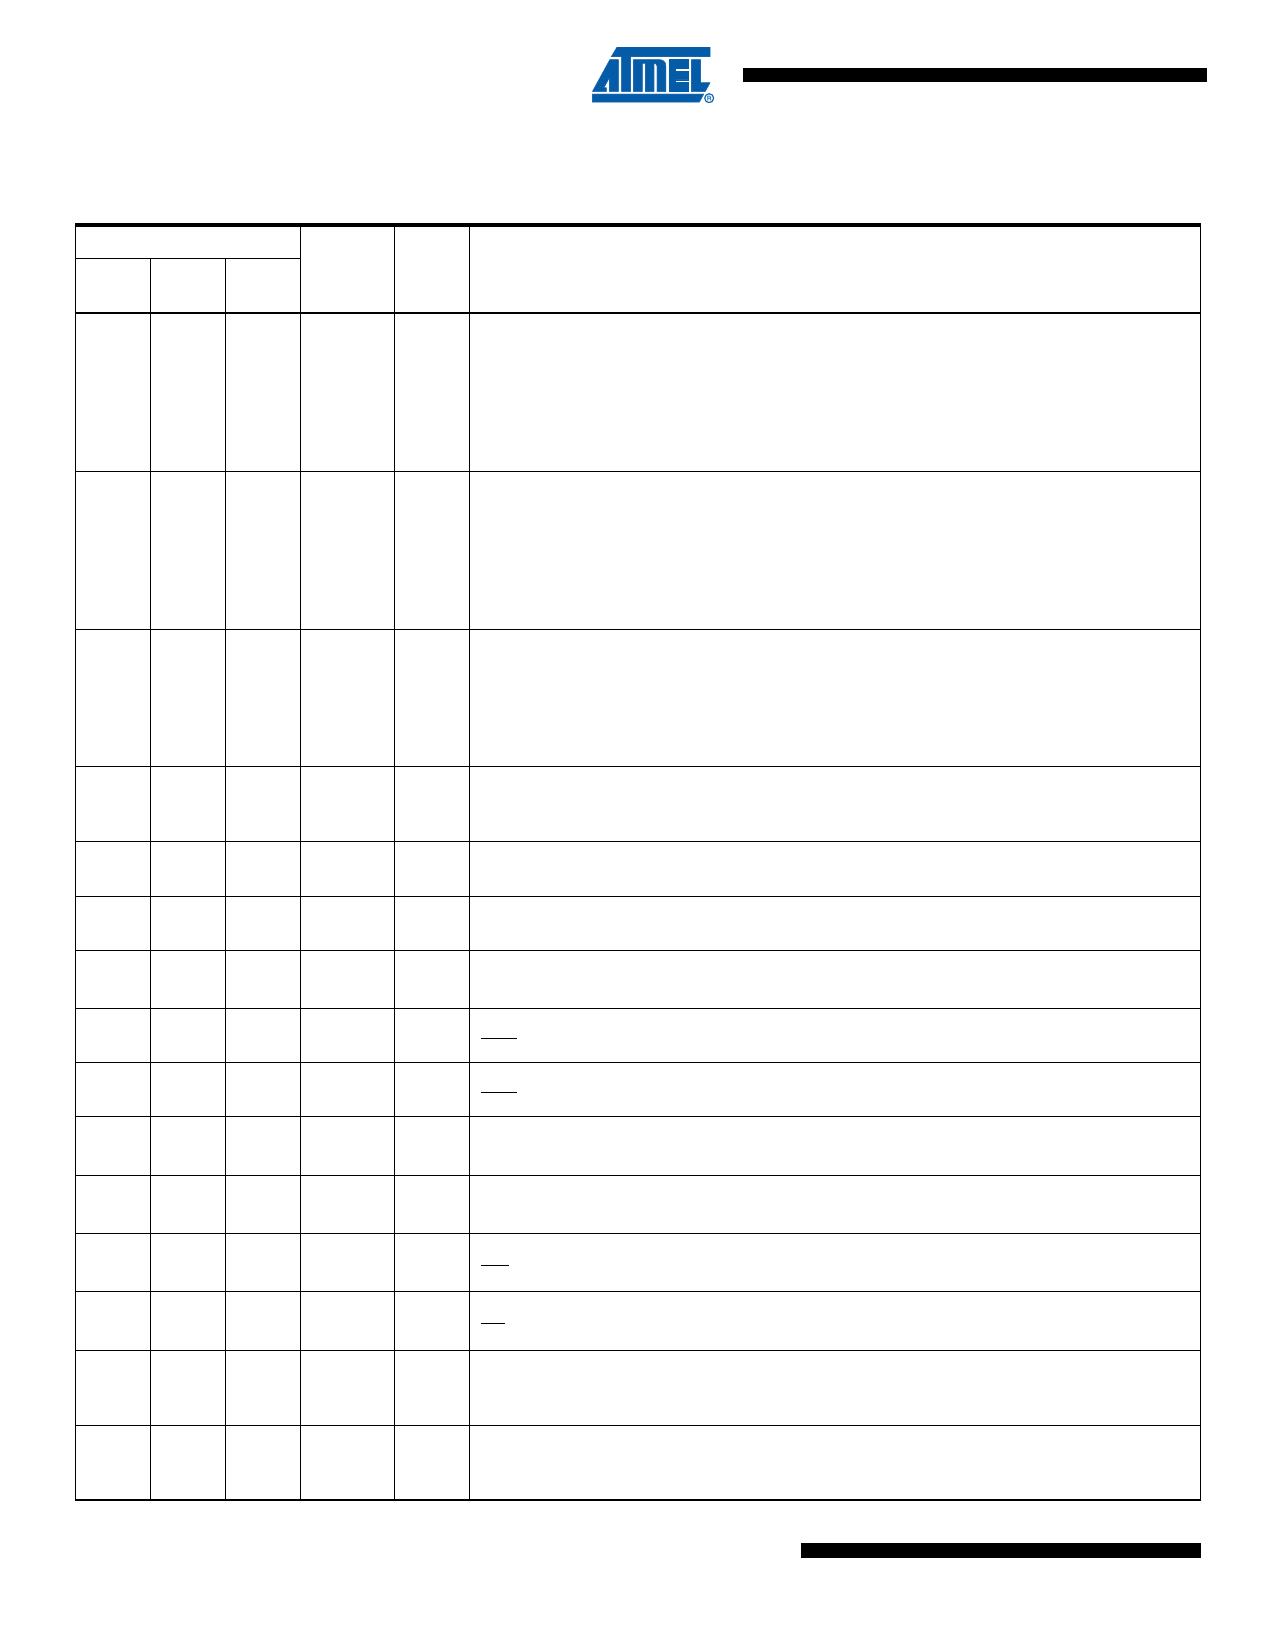 AT89LP51IC2 pdf, 반도체, 판매, 대치품